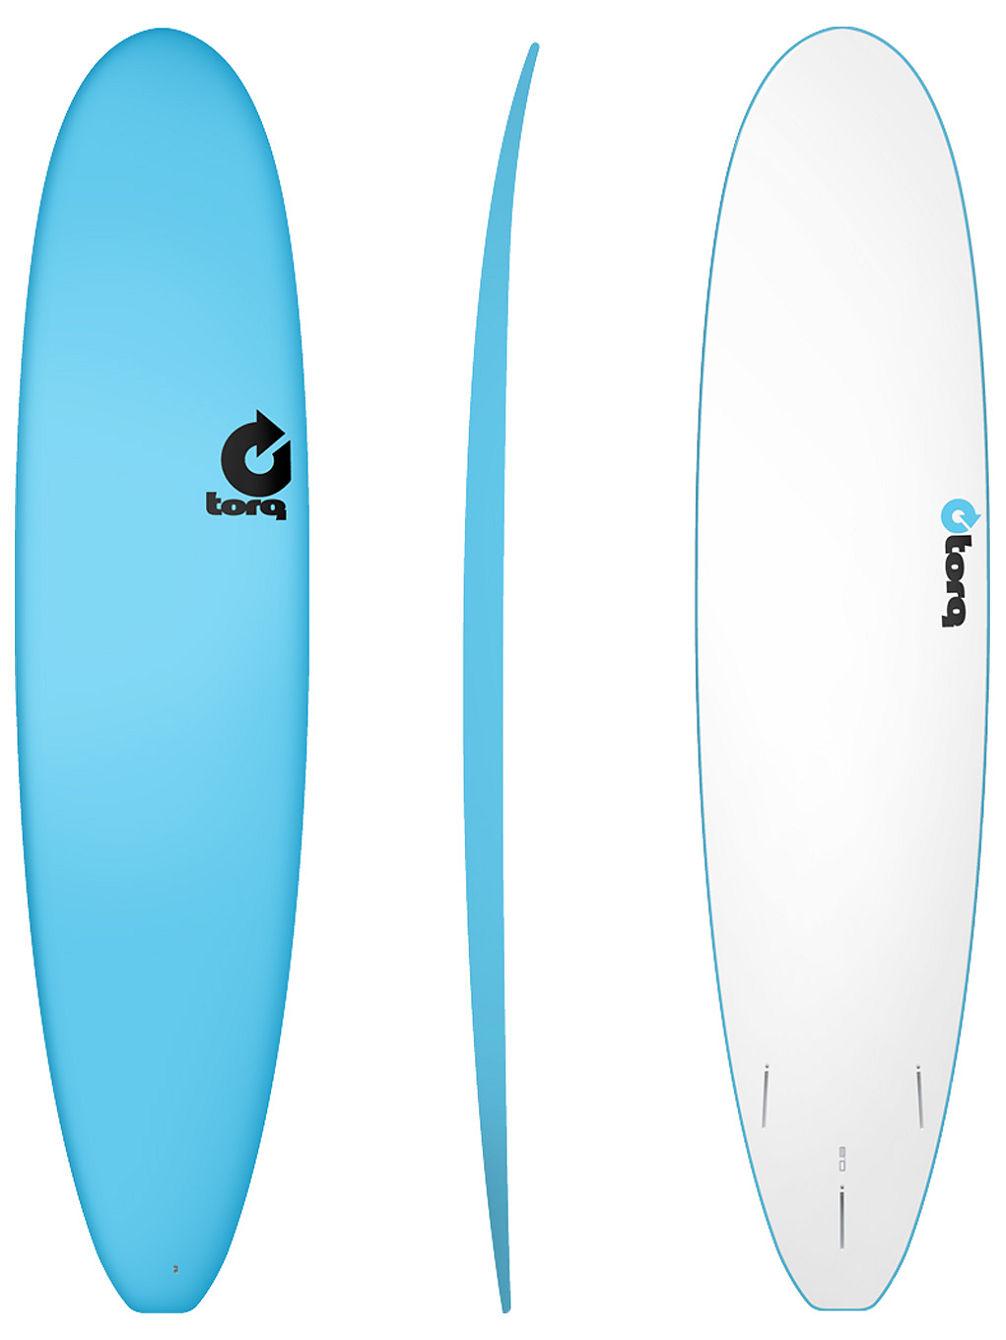 Compra torq longboard 8 0 tavola da surf online su blue - Misure tavole da surf ...